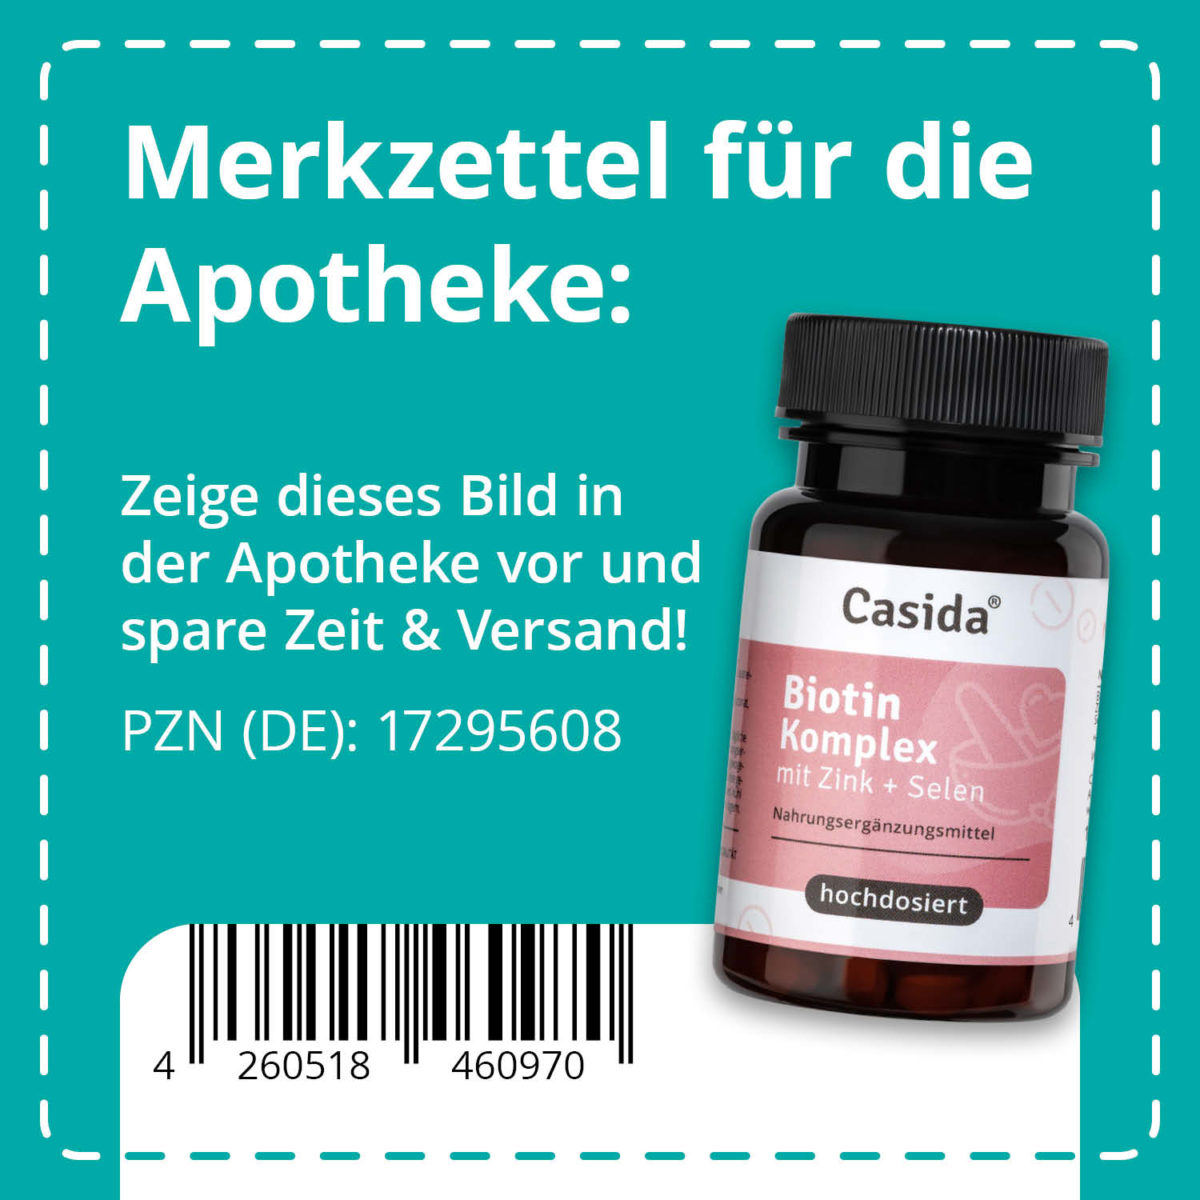 Casida Biotin complex - 10 mg 17295608 PZN pharmacy zinc selenium beautiful hair pregnancy skin